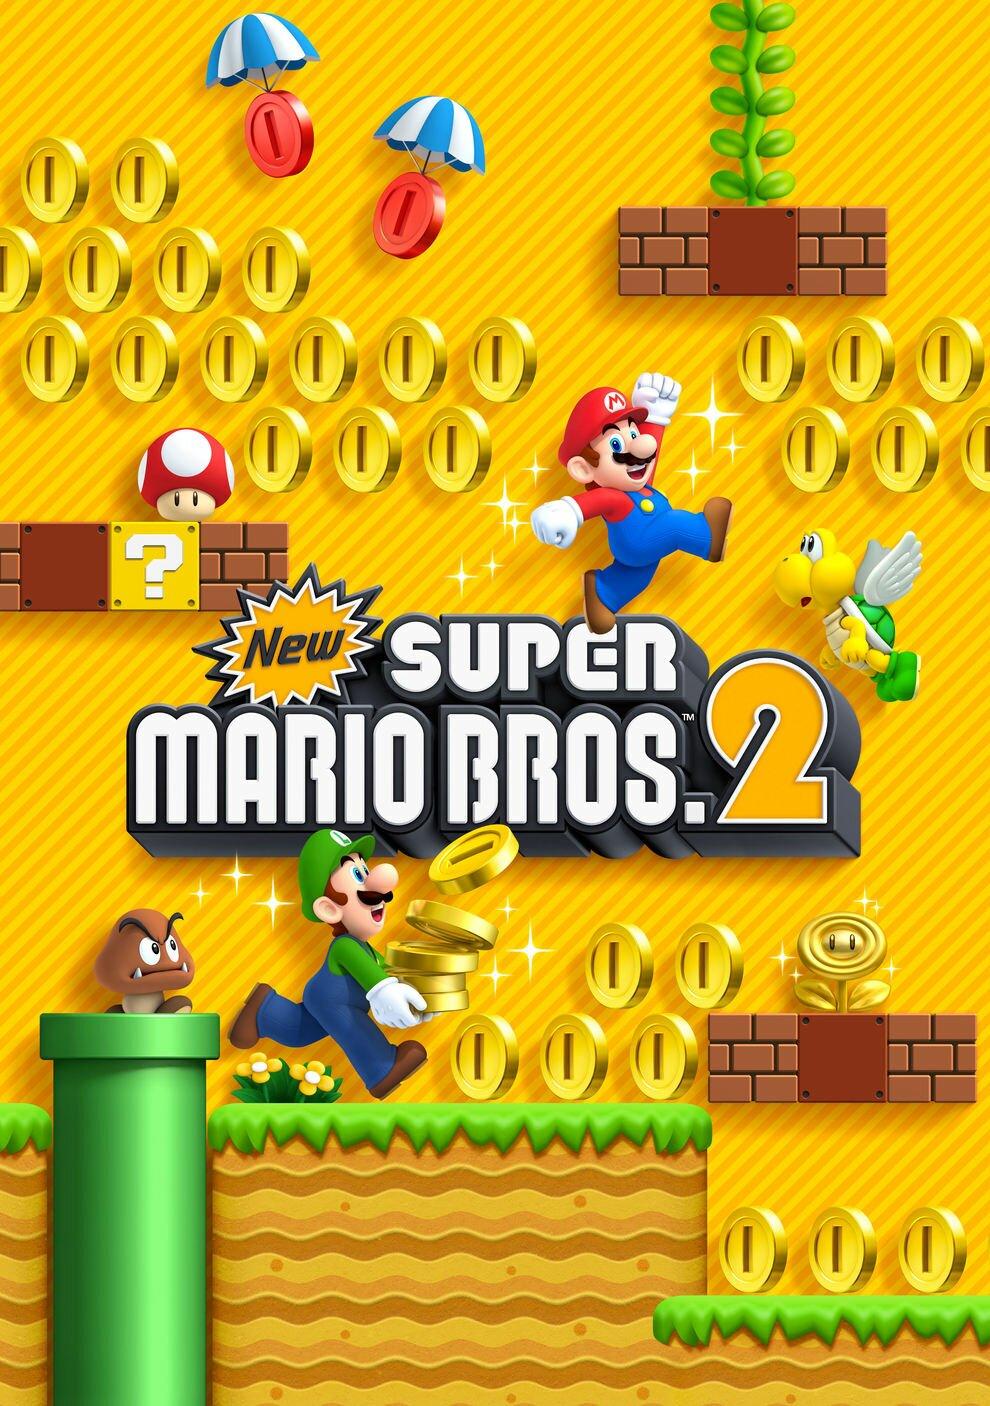 22213_new-super-mario-bros-2